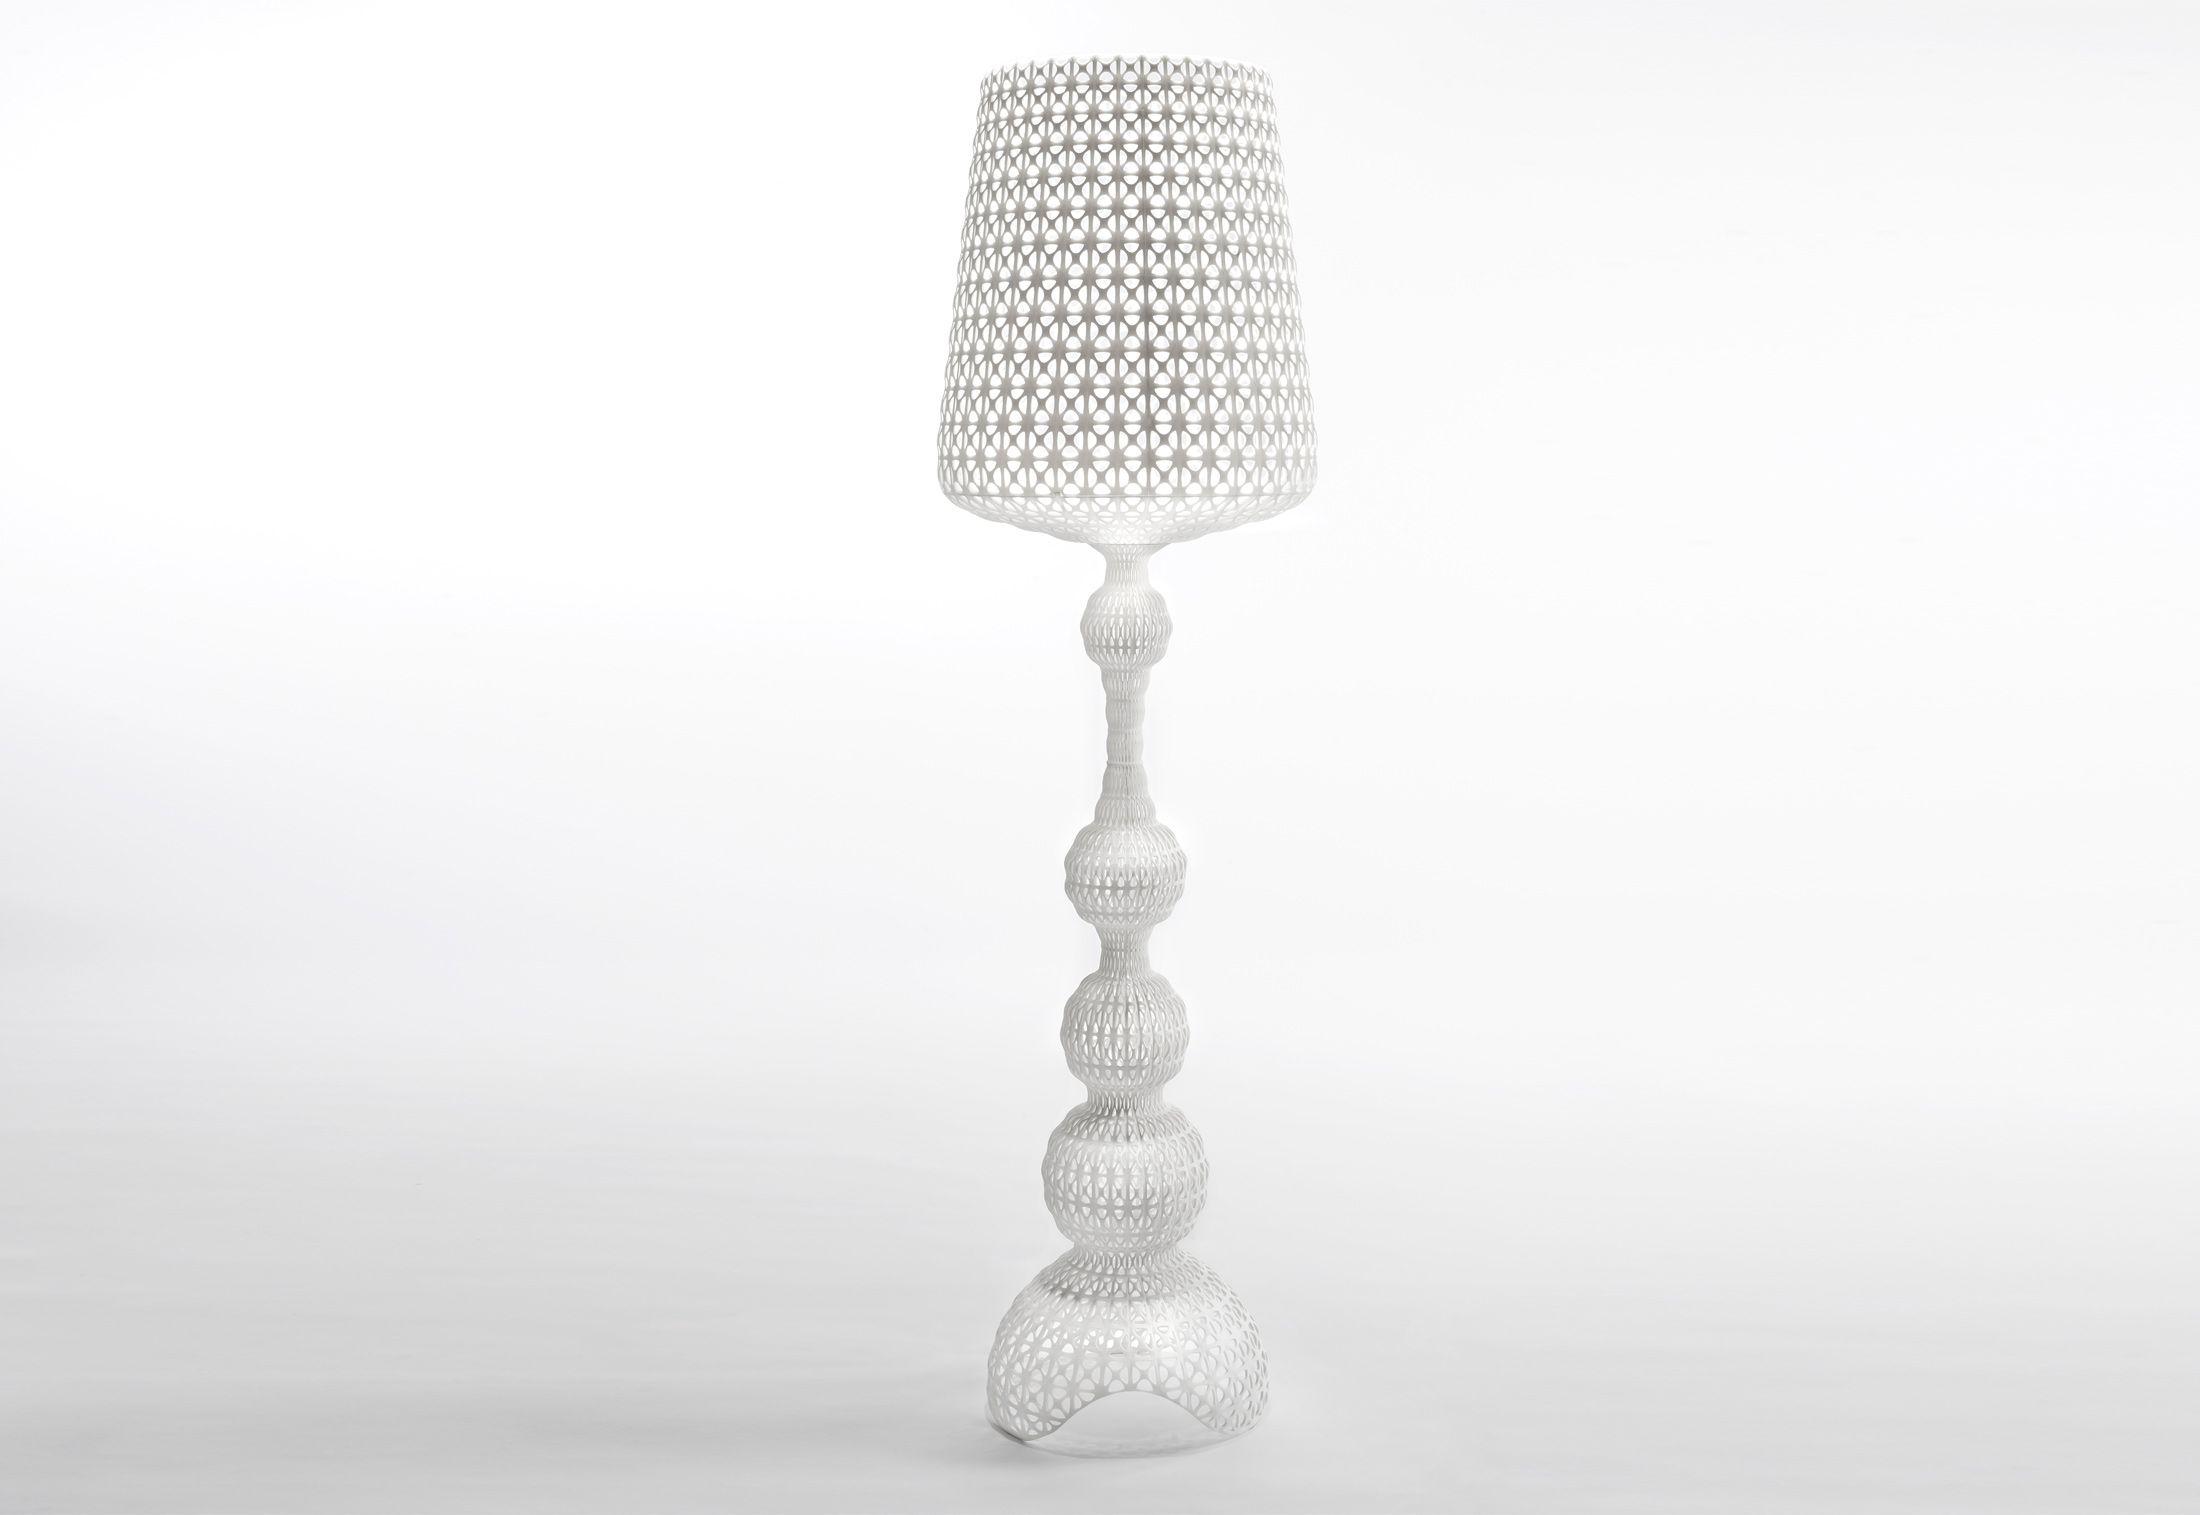 ferruccio laviani lighting. Kabuki Floor Lamp By Ferruccio Laviani For Kartell Lighting